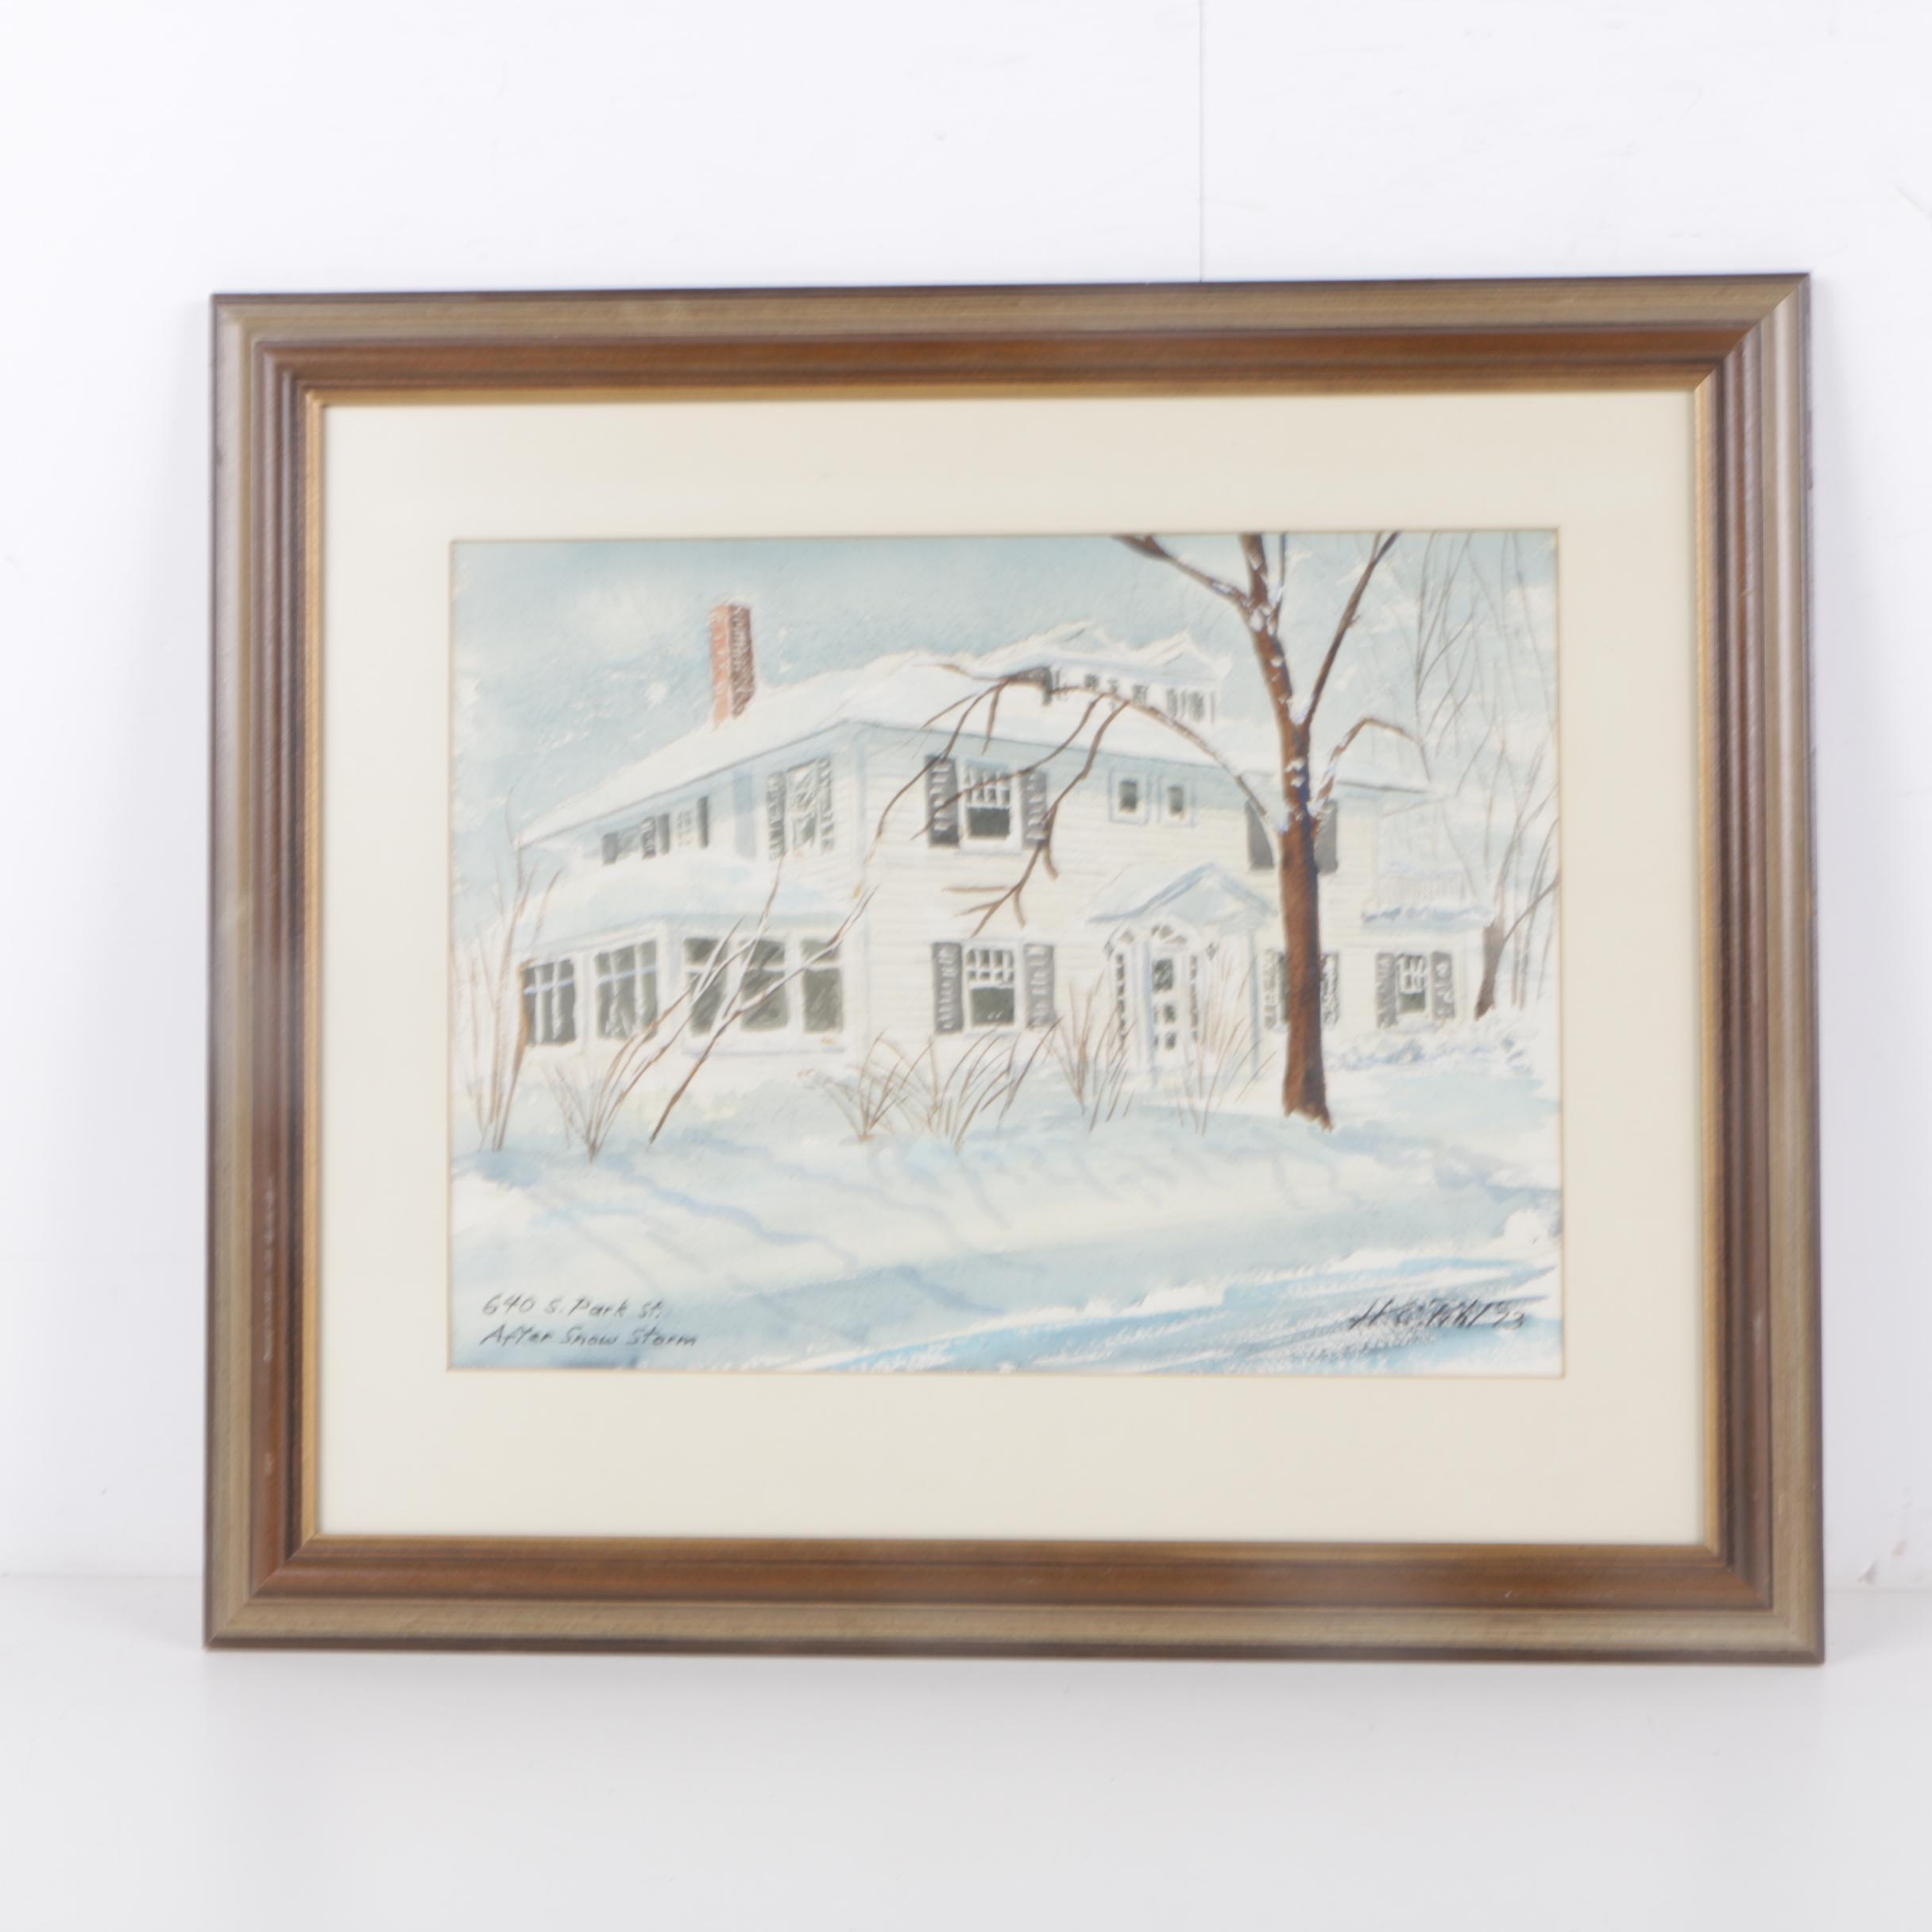 "H. C. Pihl Watercolor Painting ""640 S. Park St. After Snow Storm"""